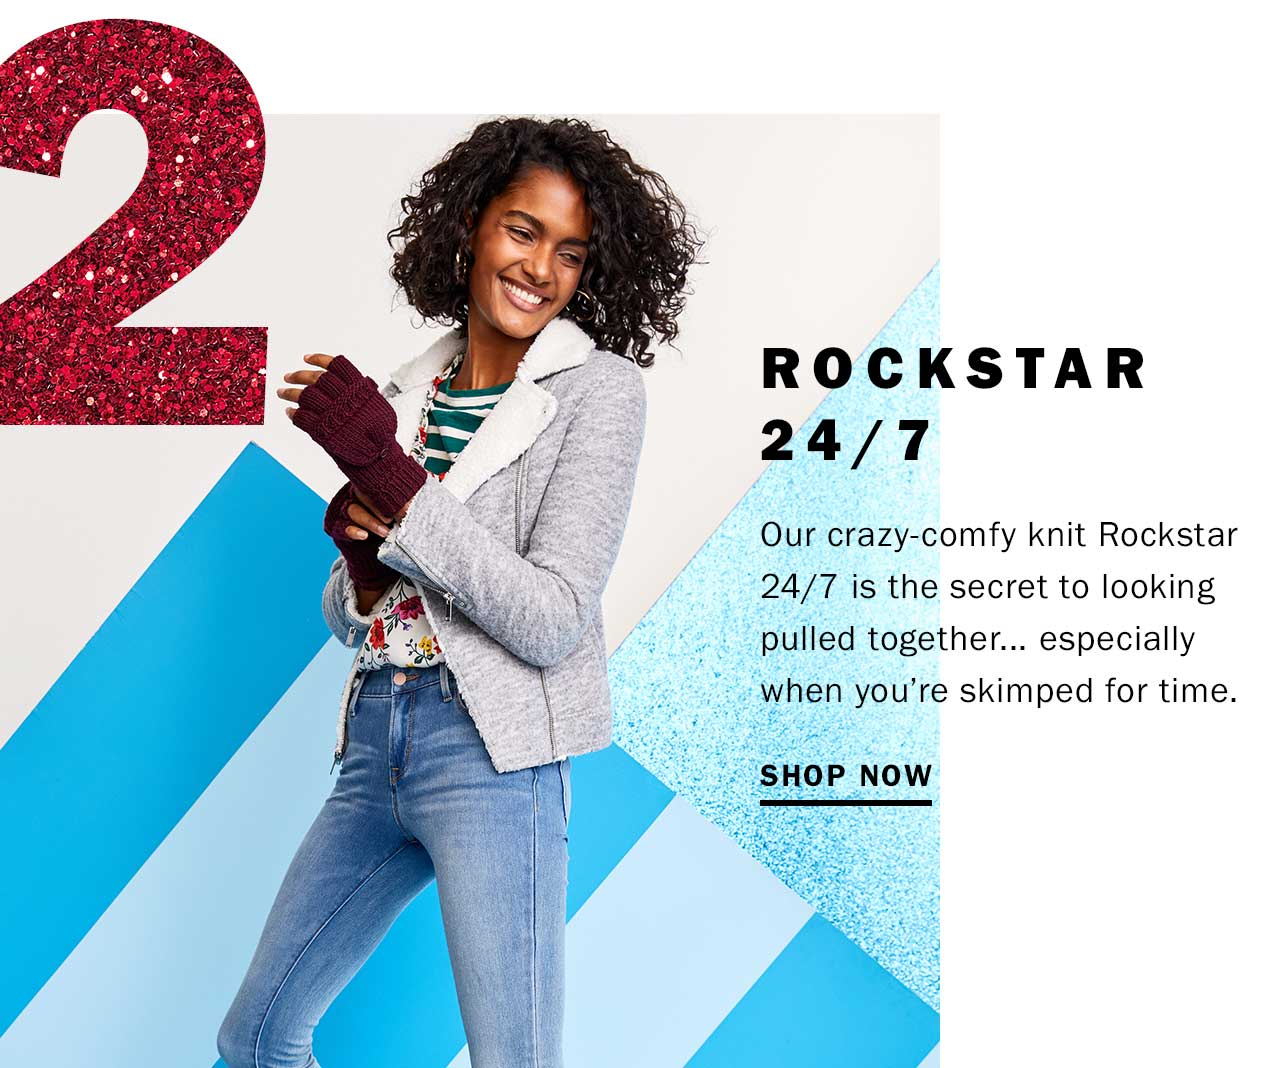 Rockstar 24/7